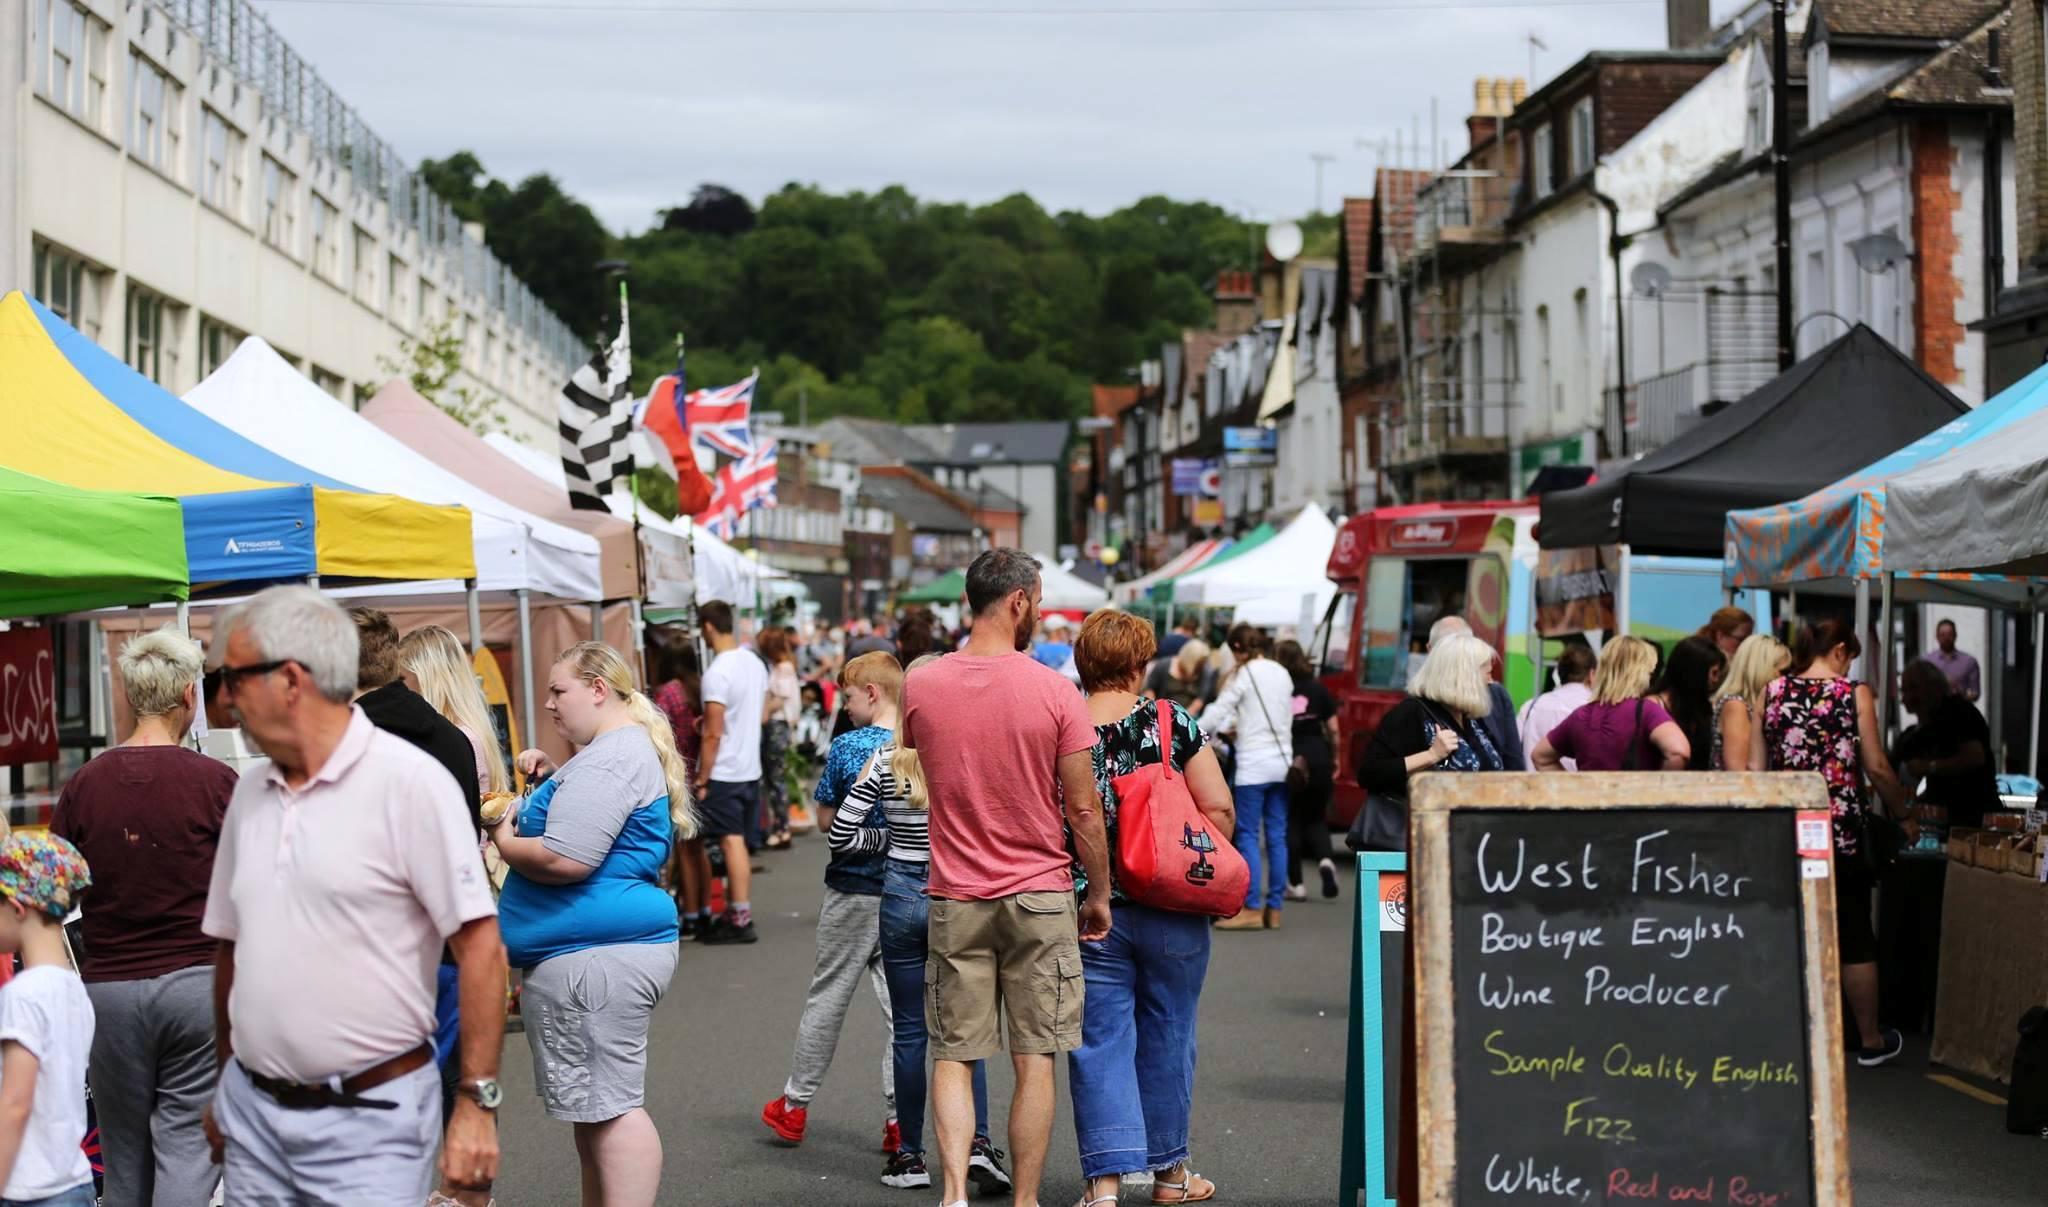 Caterham Food Festival takes place on Sunday June 10 (Photo Caterham Festival)